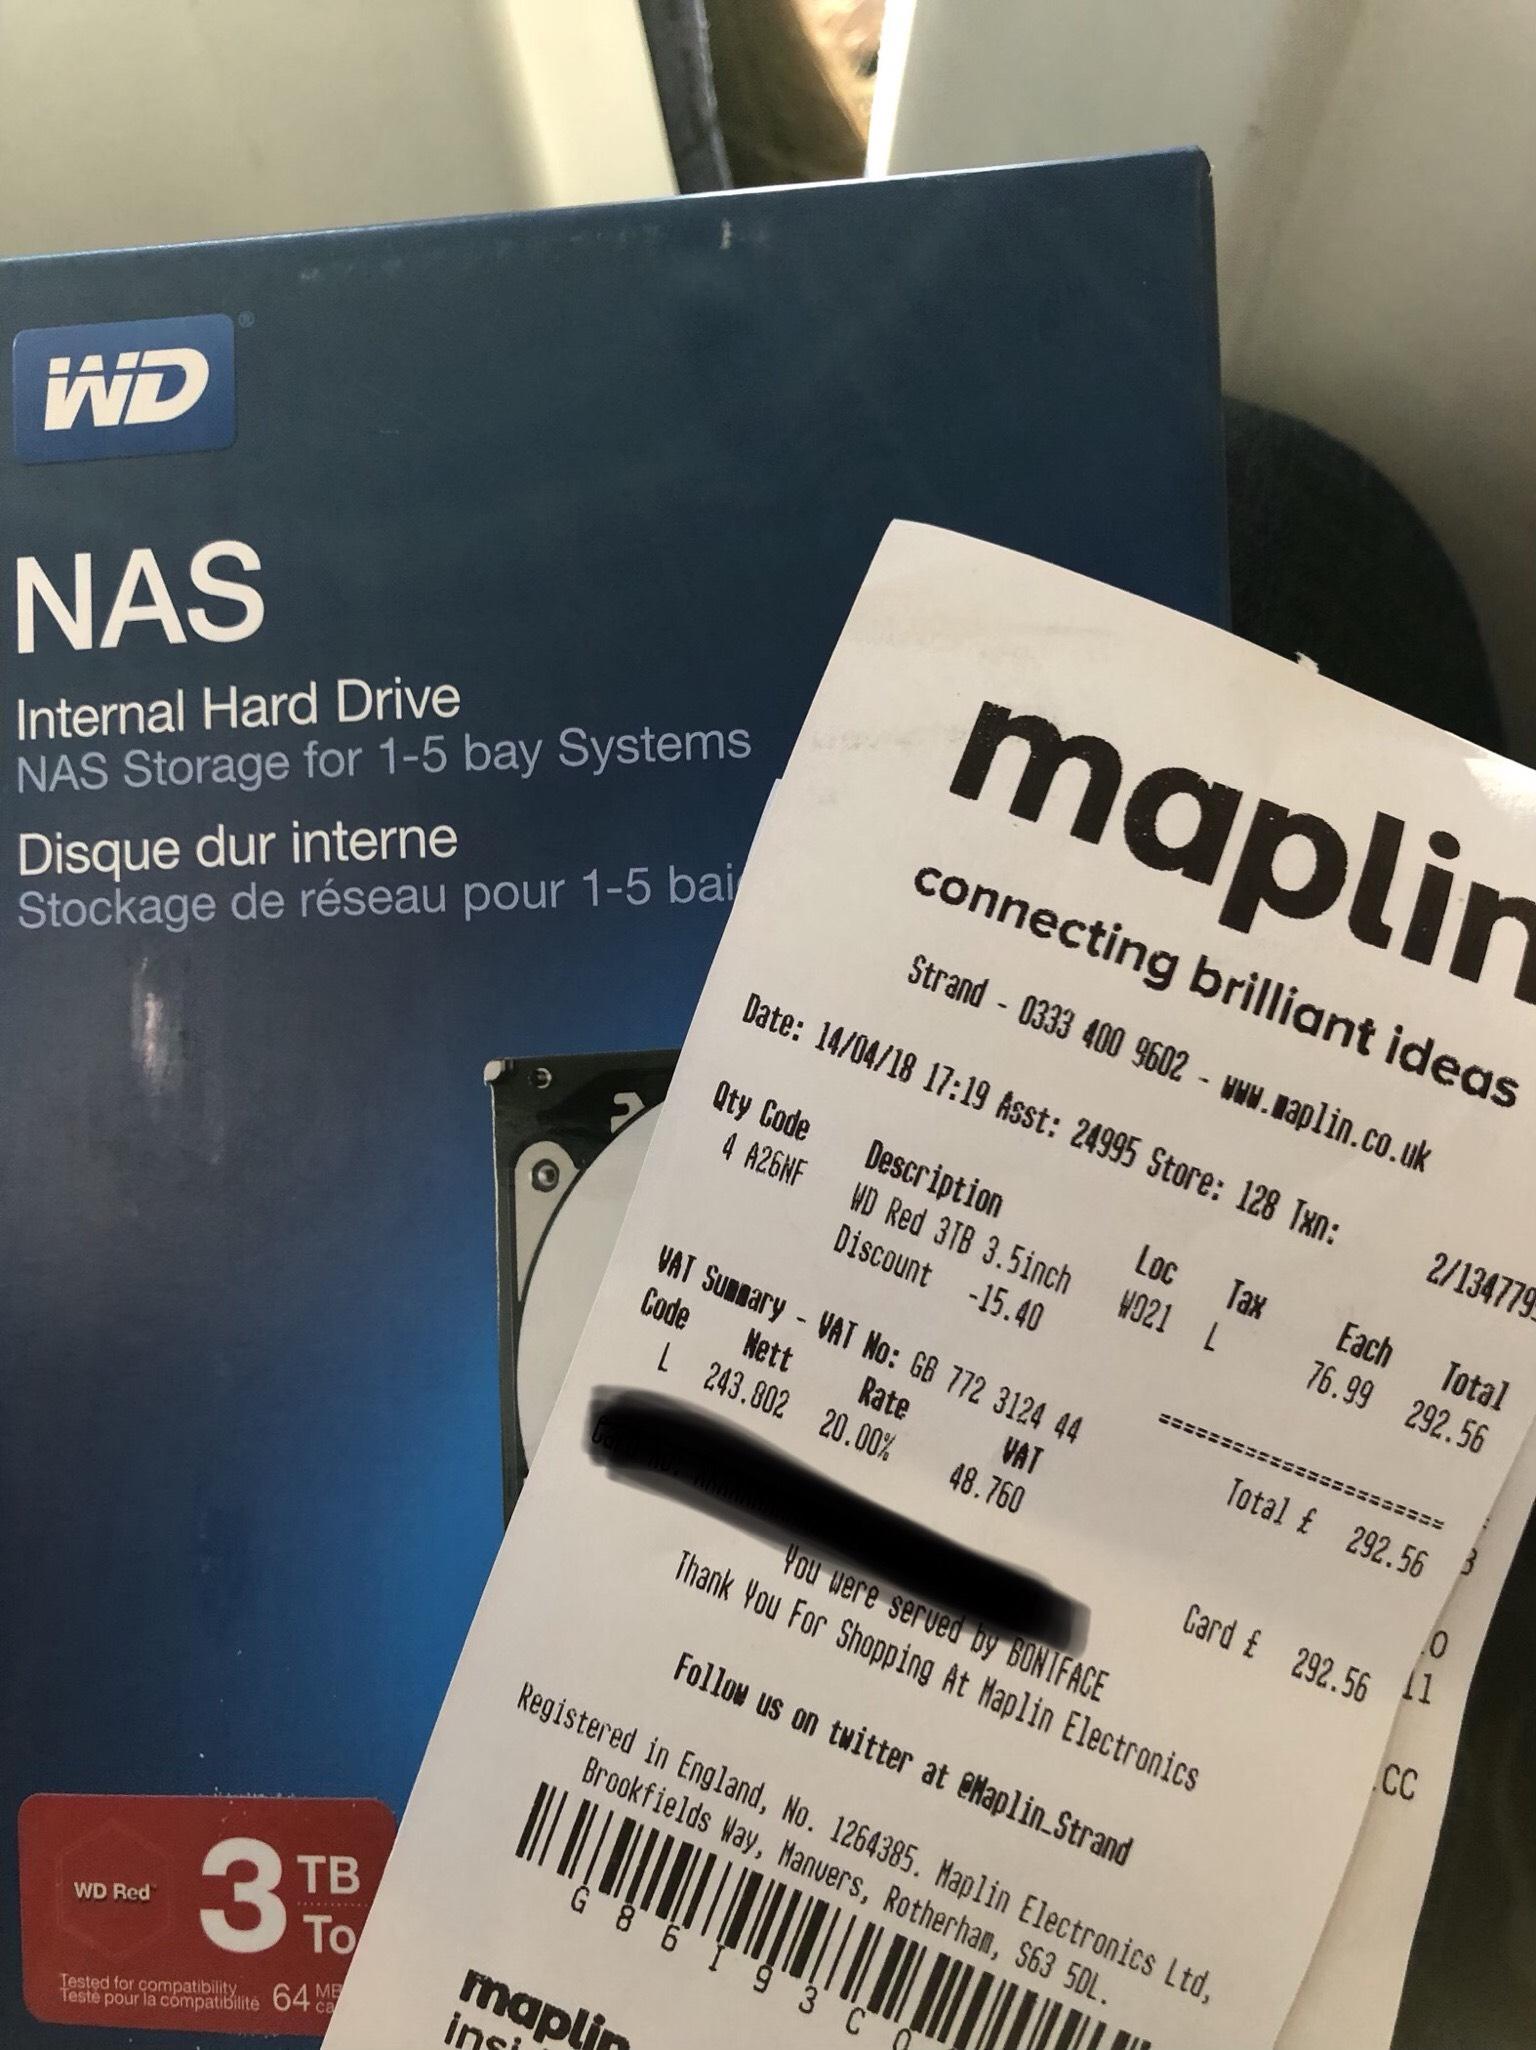 WD Red 3TB Hard Drive £73 instore @ Maplin